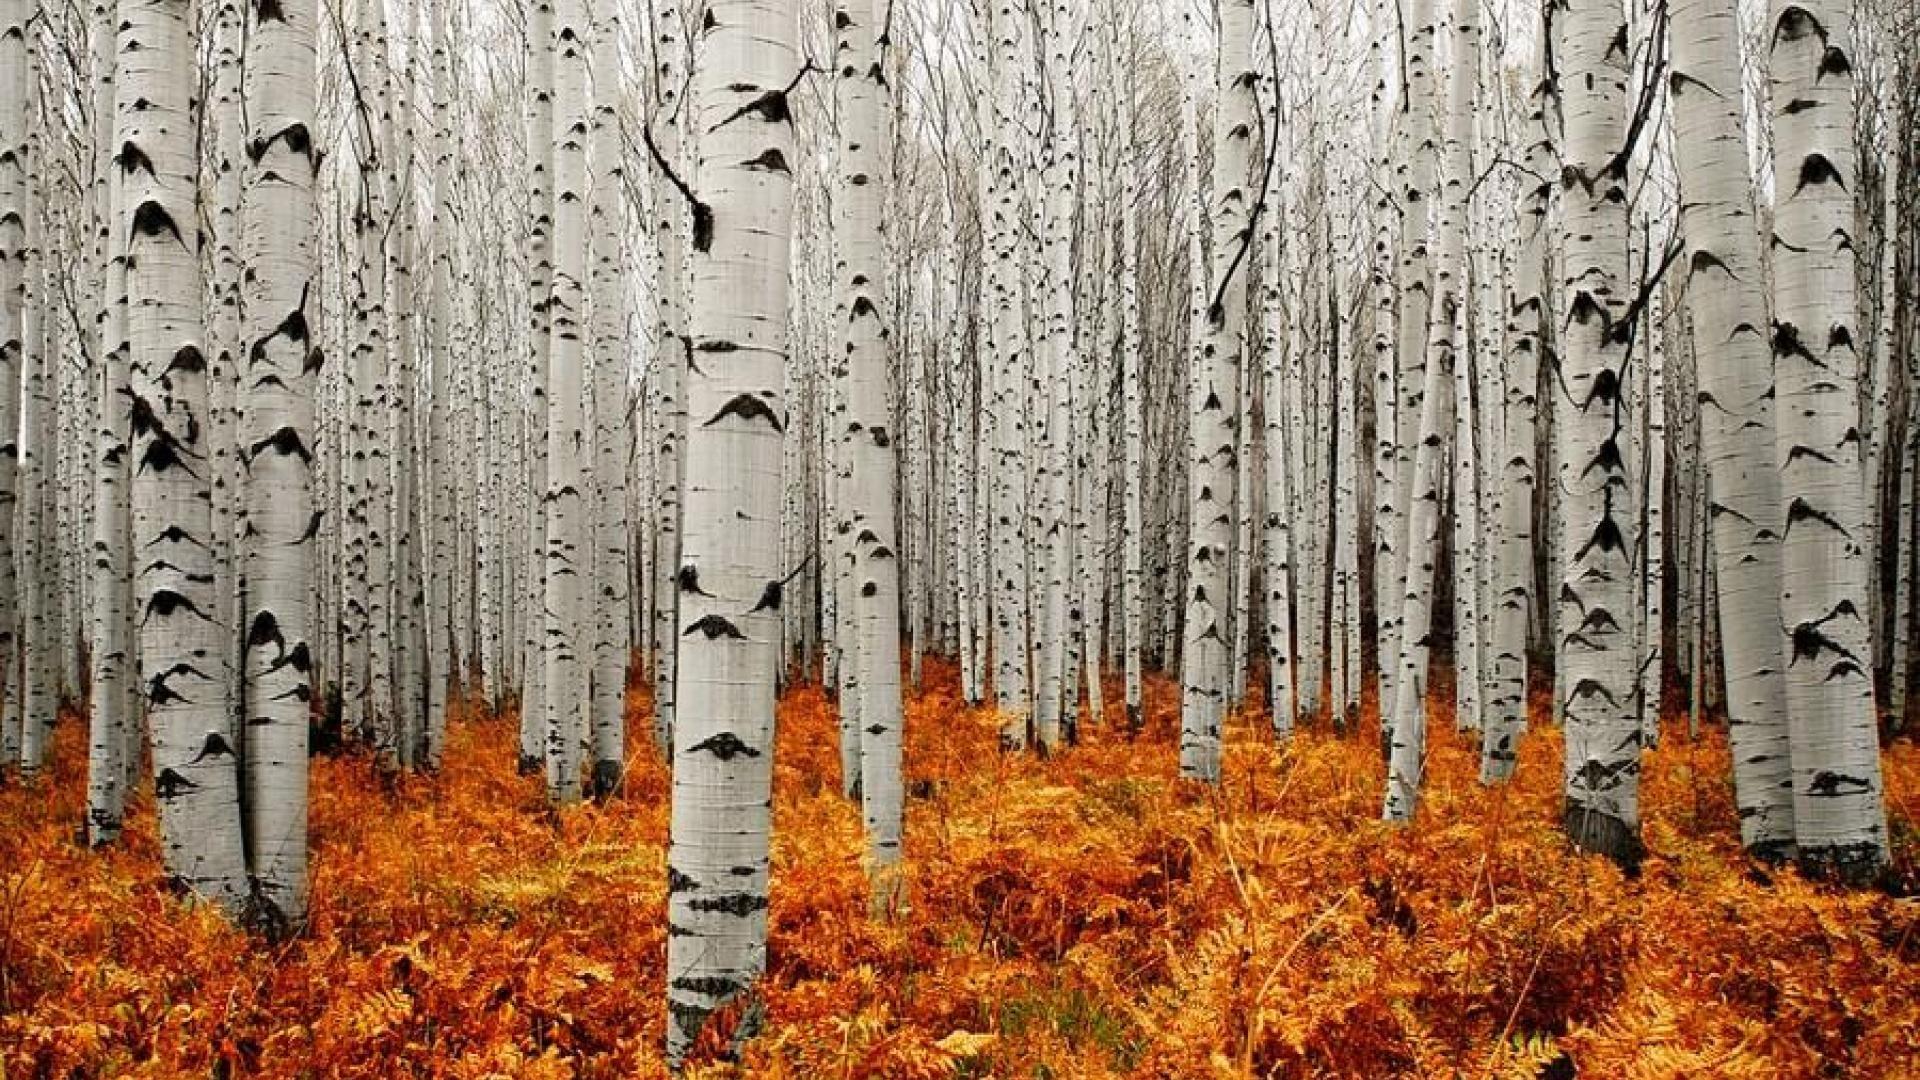 Poets Of The Fall Wallpaper Aspen Tree Wallpapers Hd Pixelstalk Net Натуральный